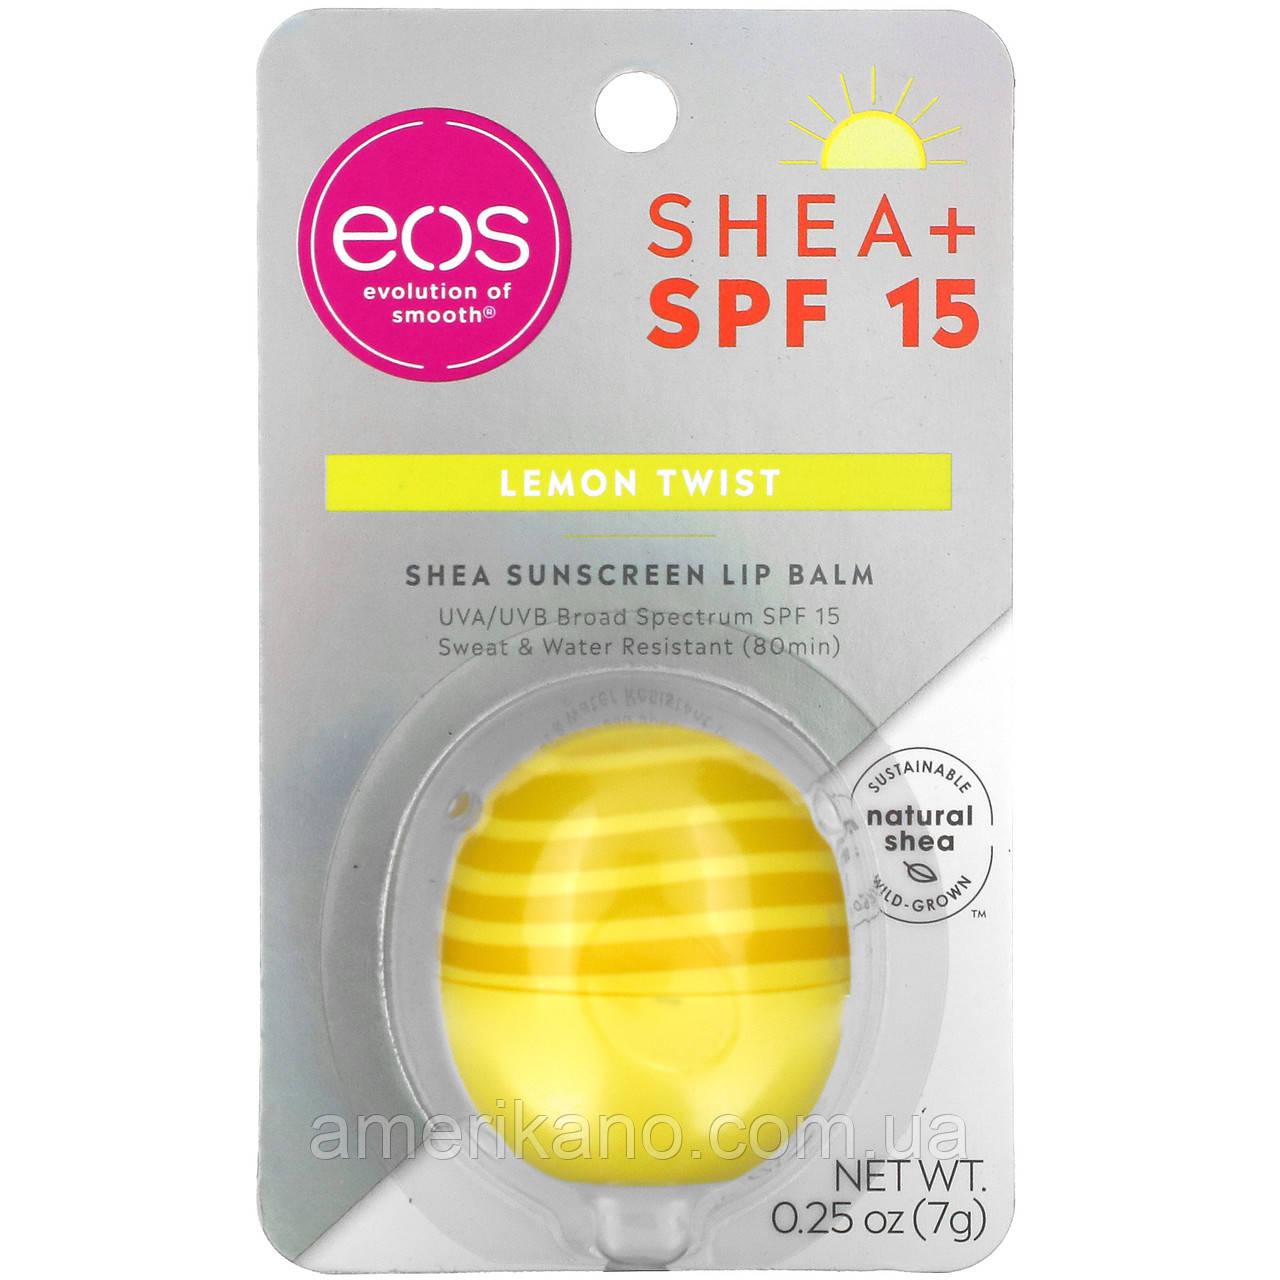 Бальзам для губ EOS, Shea Sunscreen Lip Balm with SPF 15, Lemon Twist Лимон